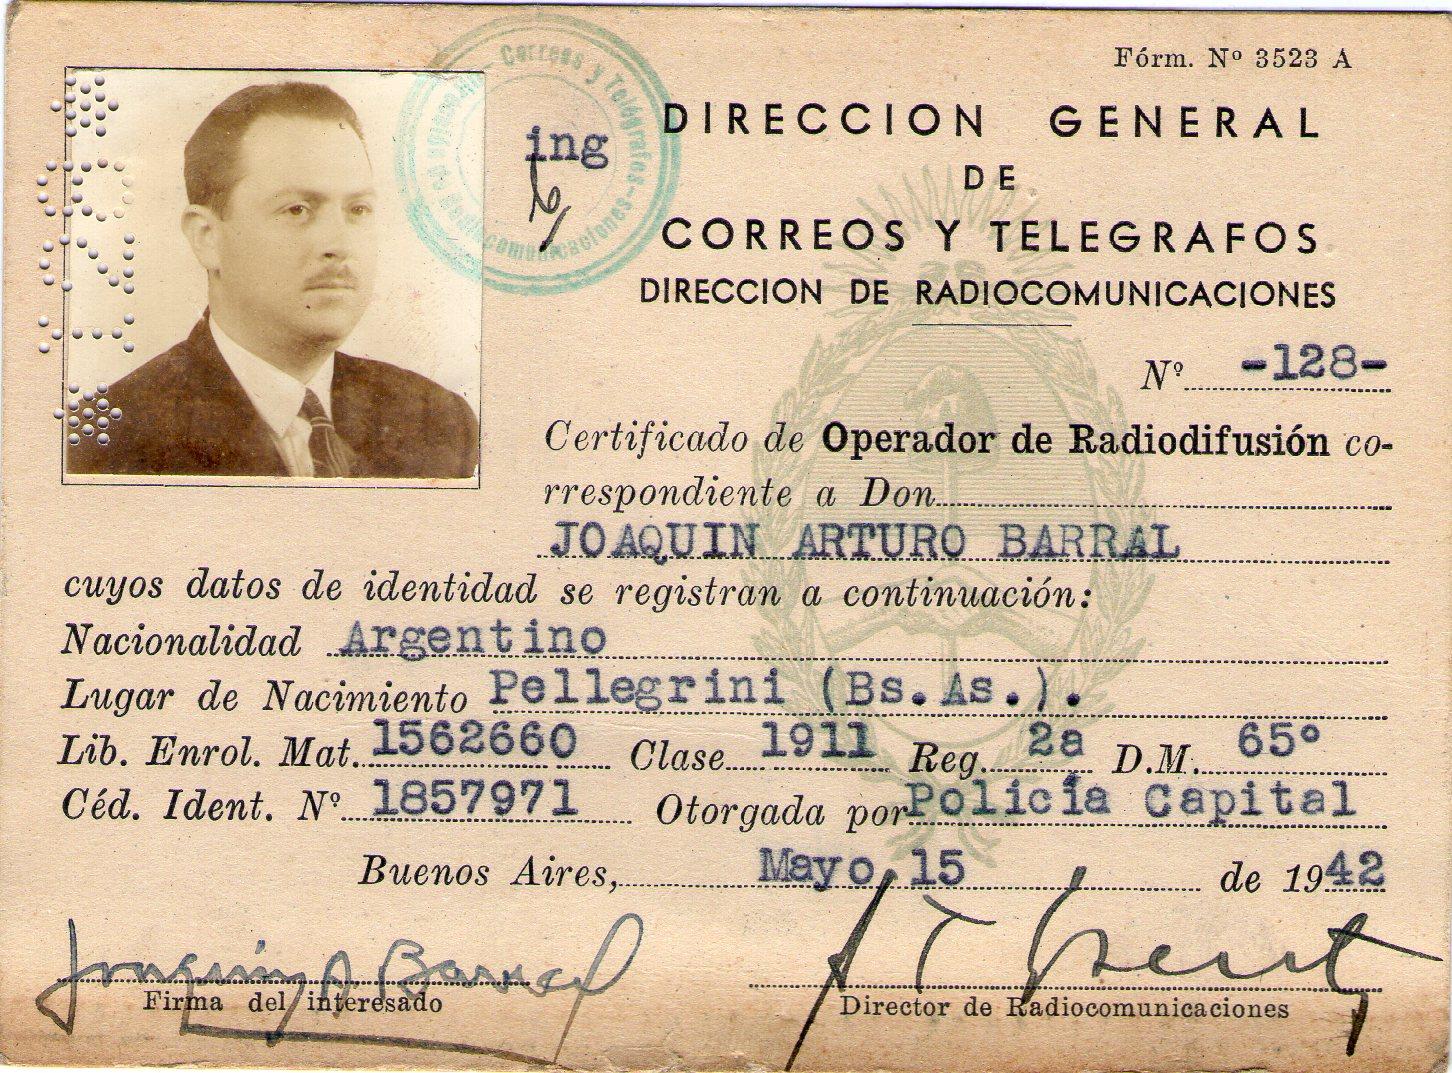 Joaquin Arturo Barral